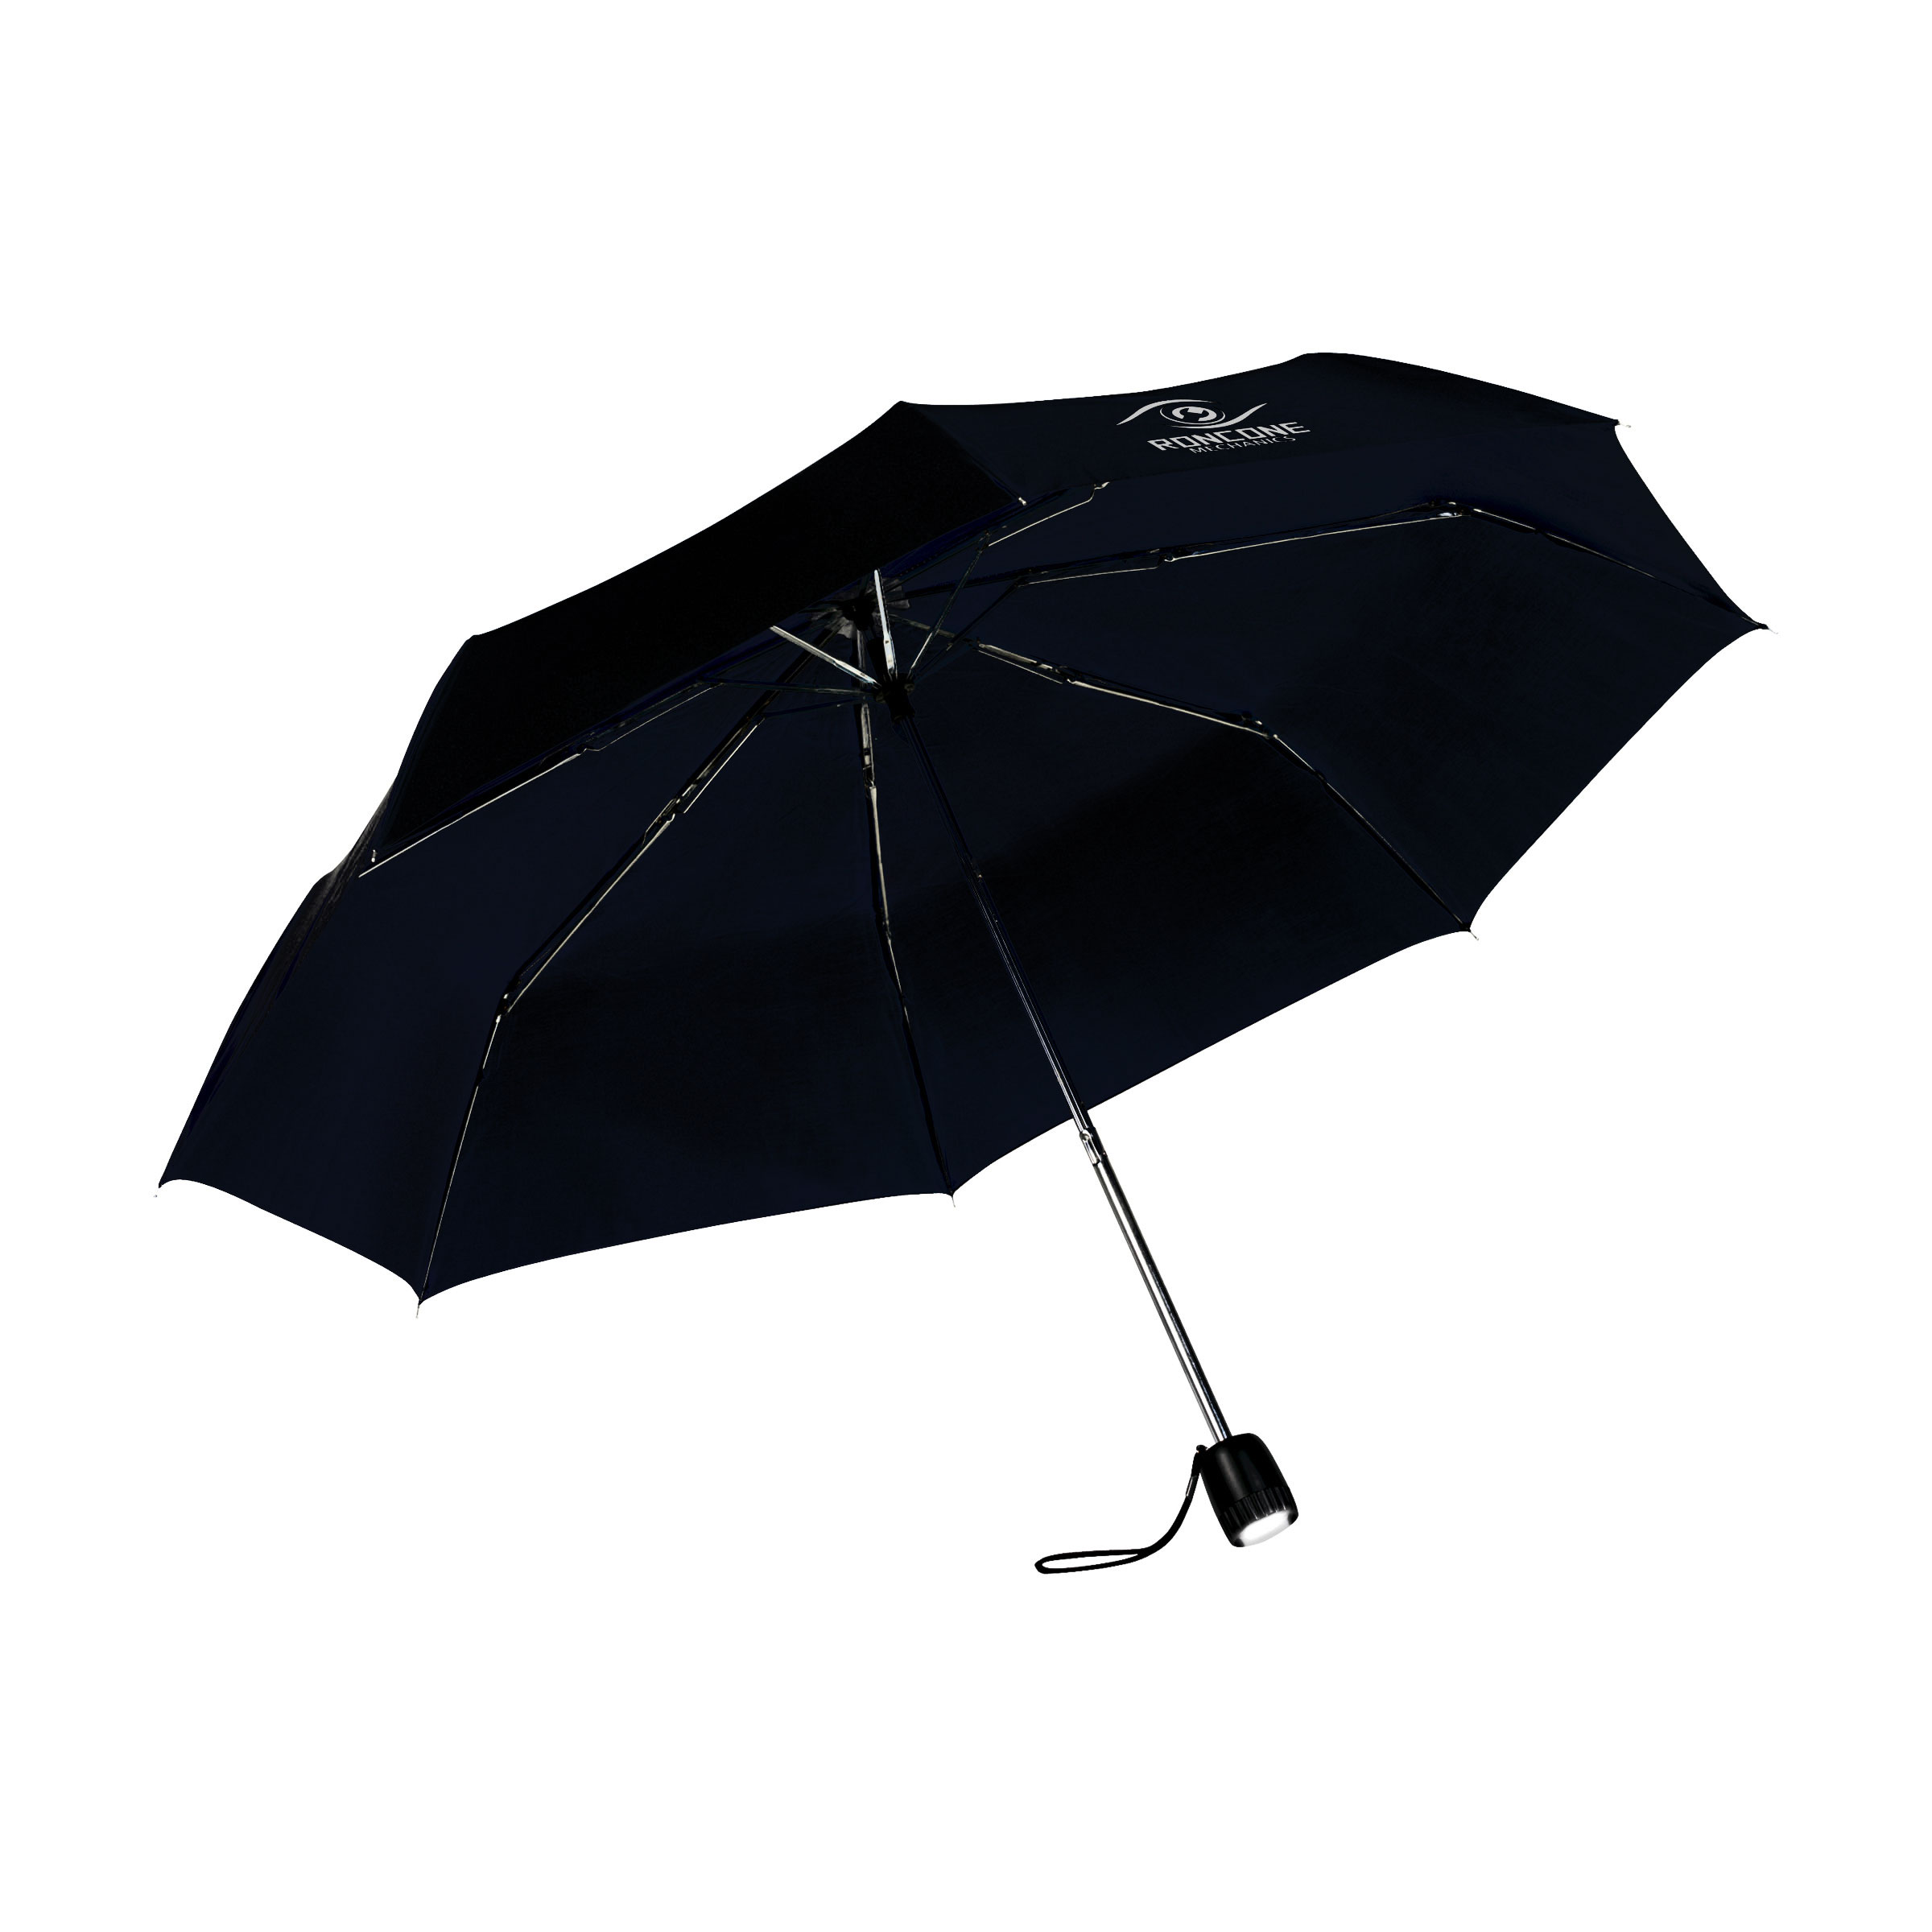 Paraplu met zaklamp - Parapluwereld